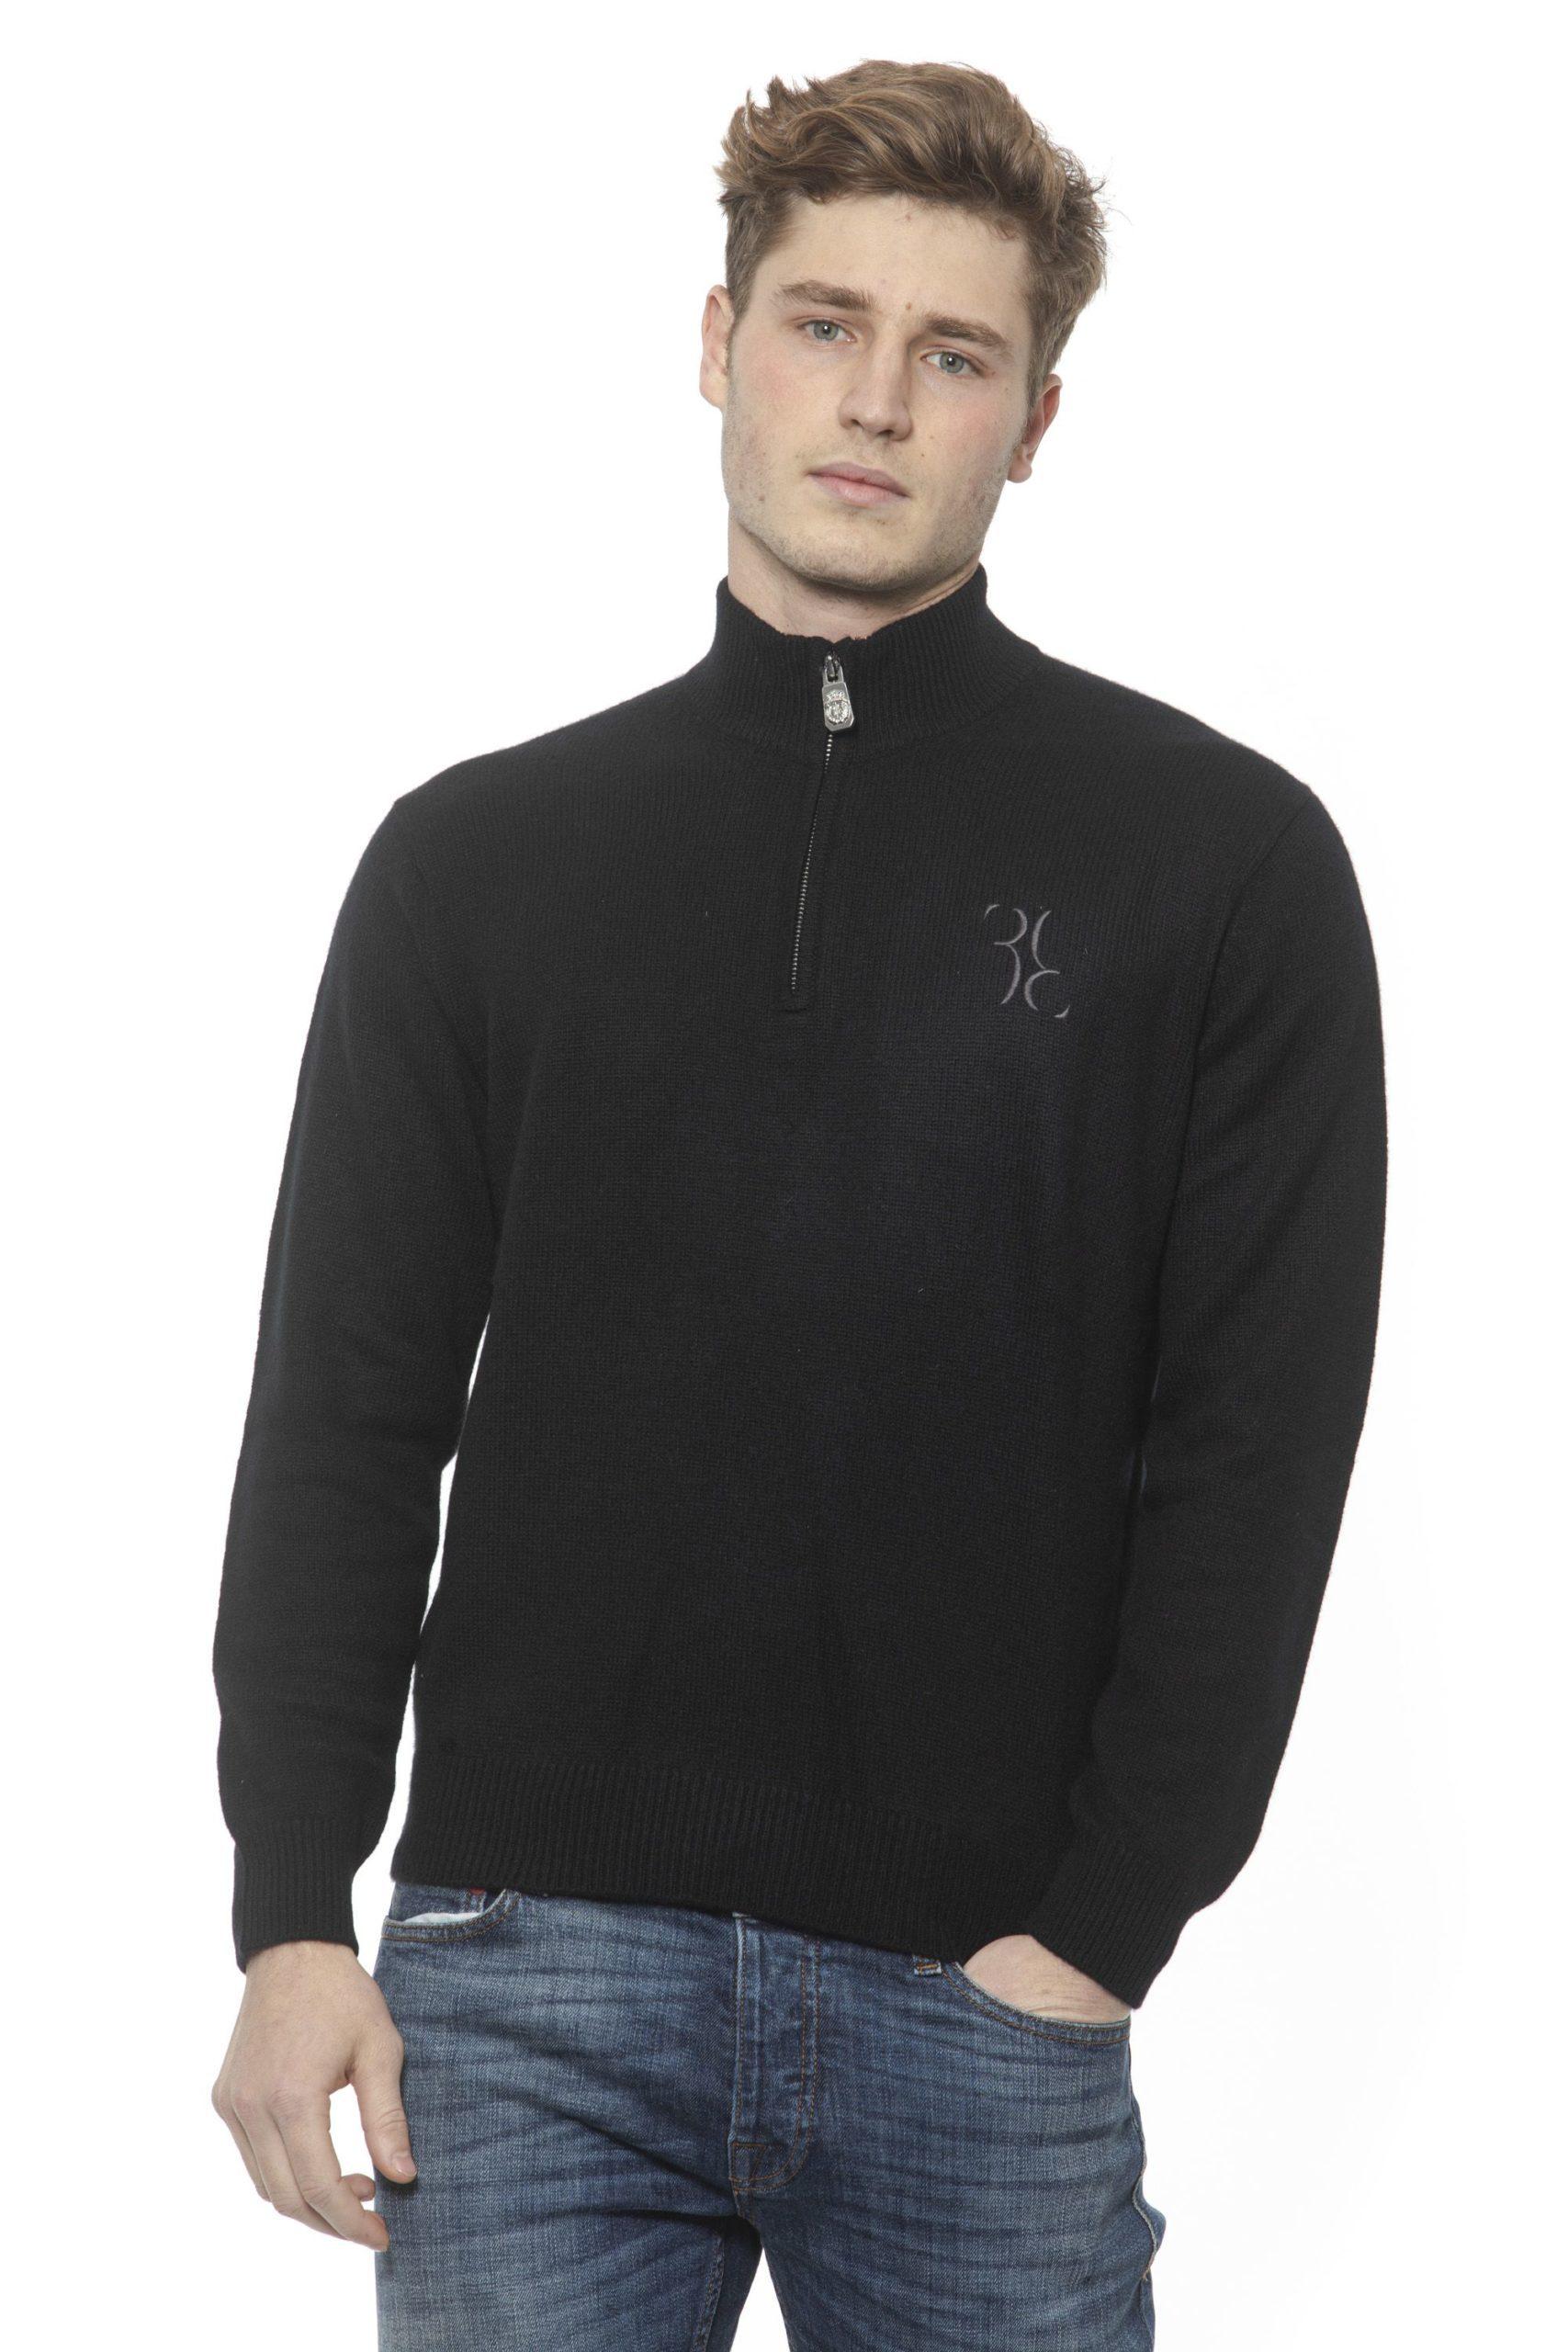 Billionaire Italian Couture Men's Nero Sweater Black BI1313352 - M